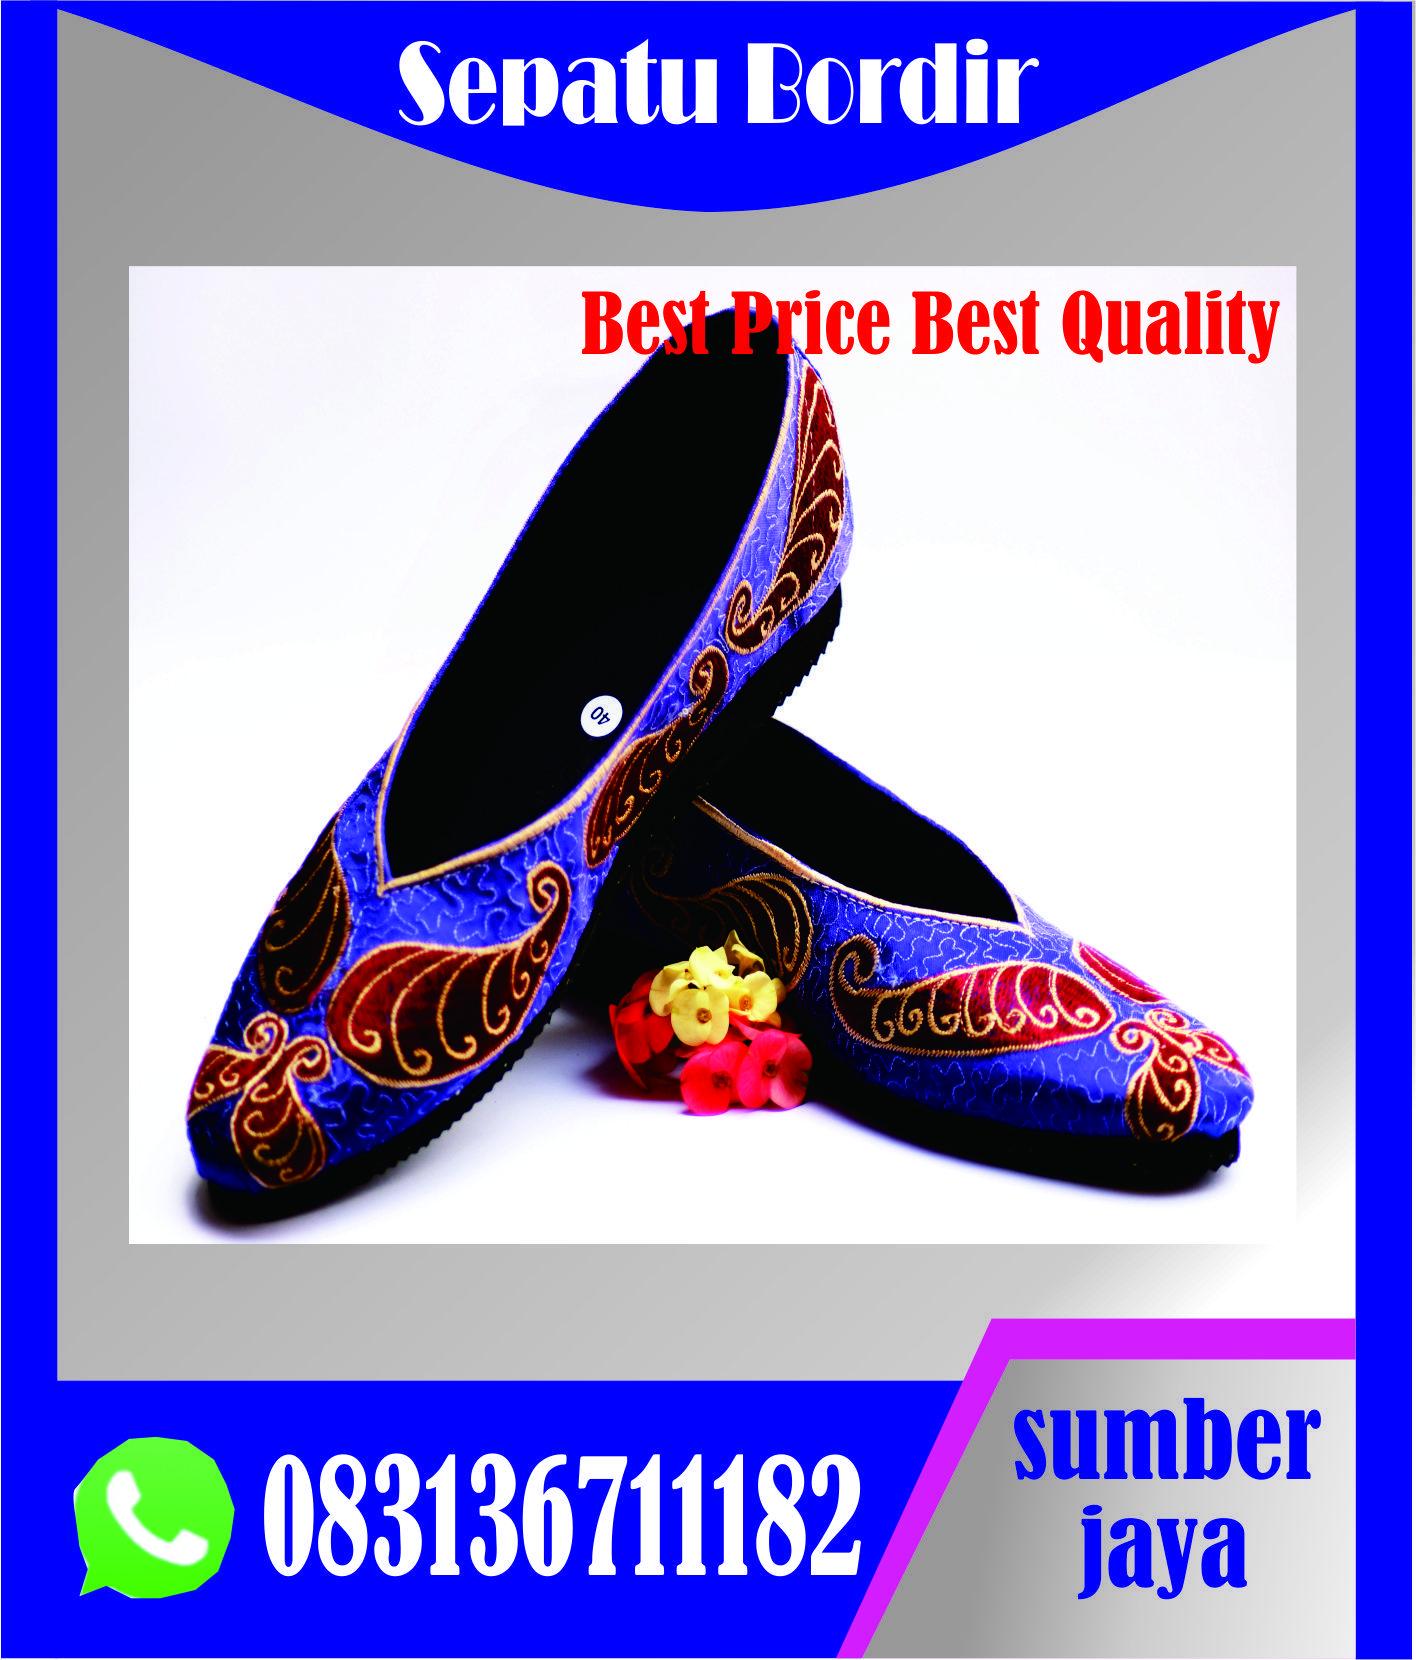 Sepatu Bordir Jawa Tengah Sepatu Bordir Lawang Sepatu Bordir